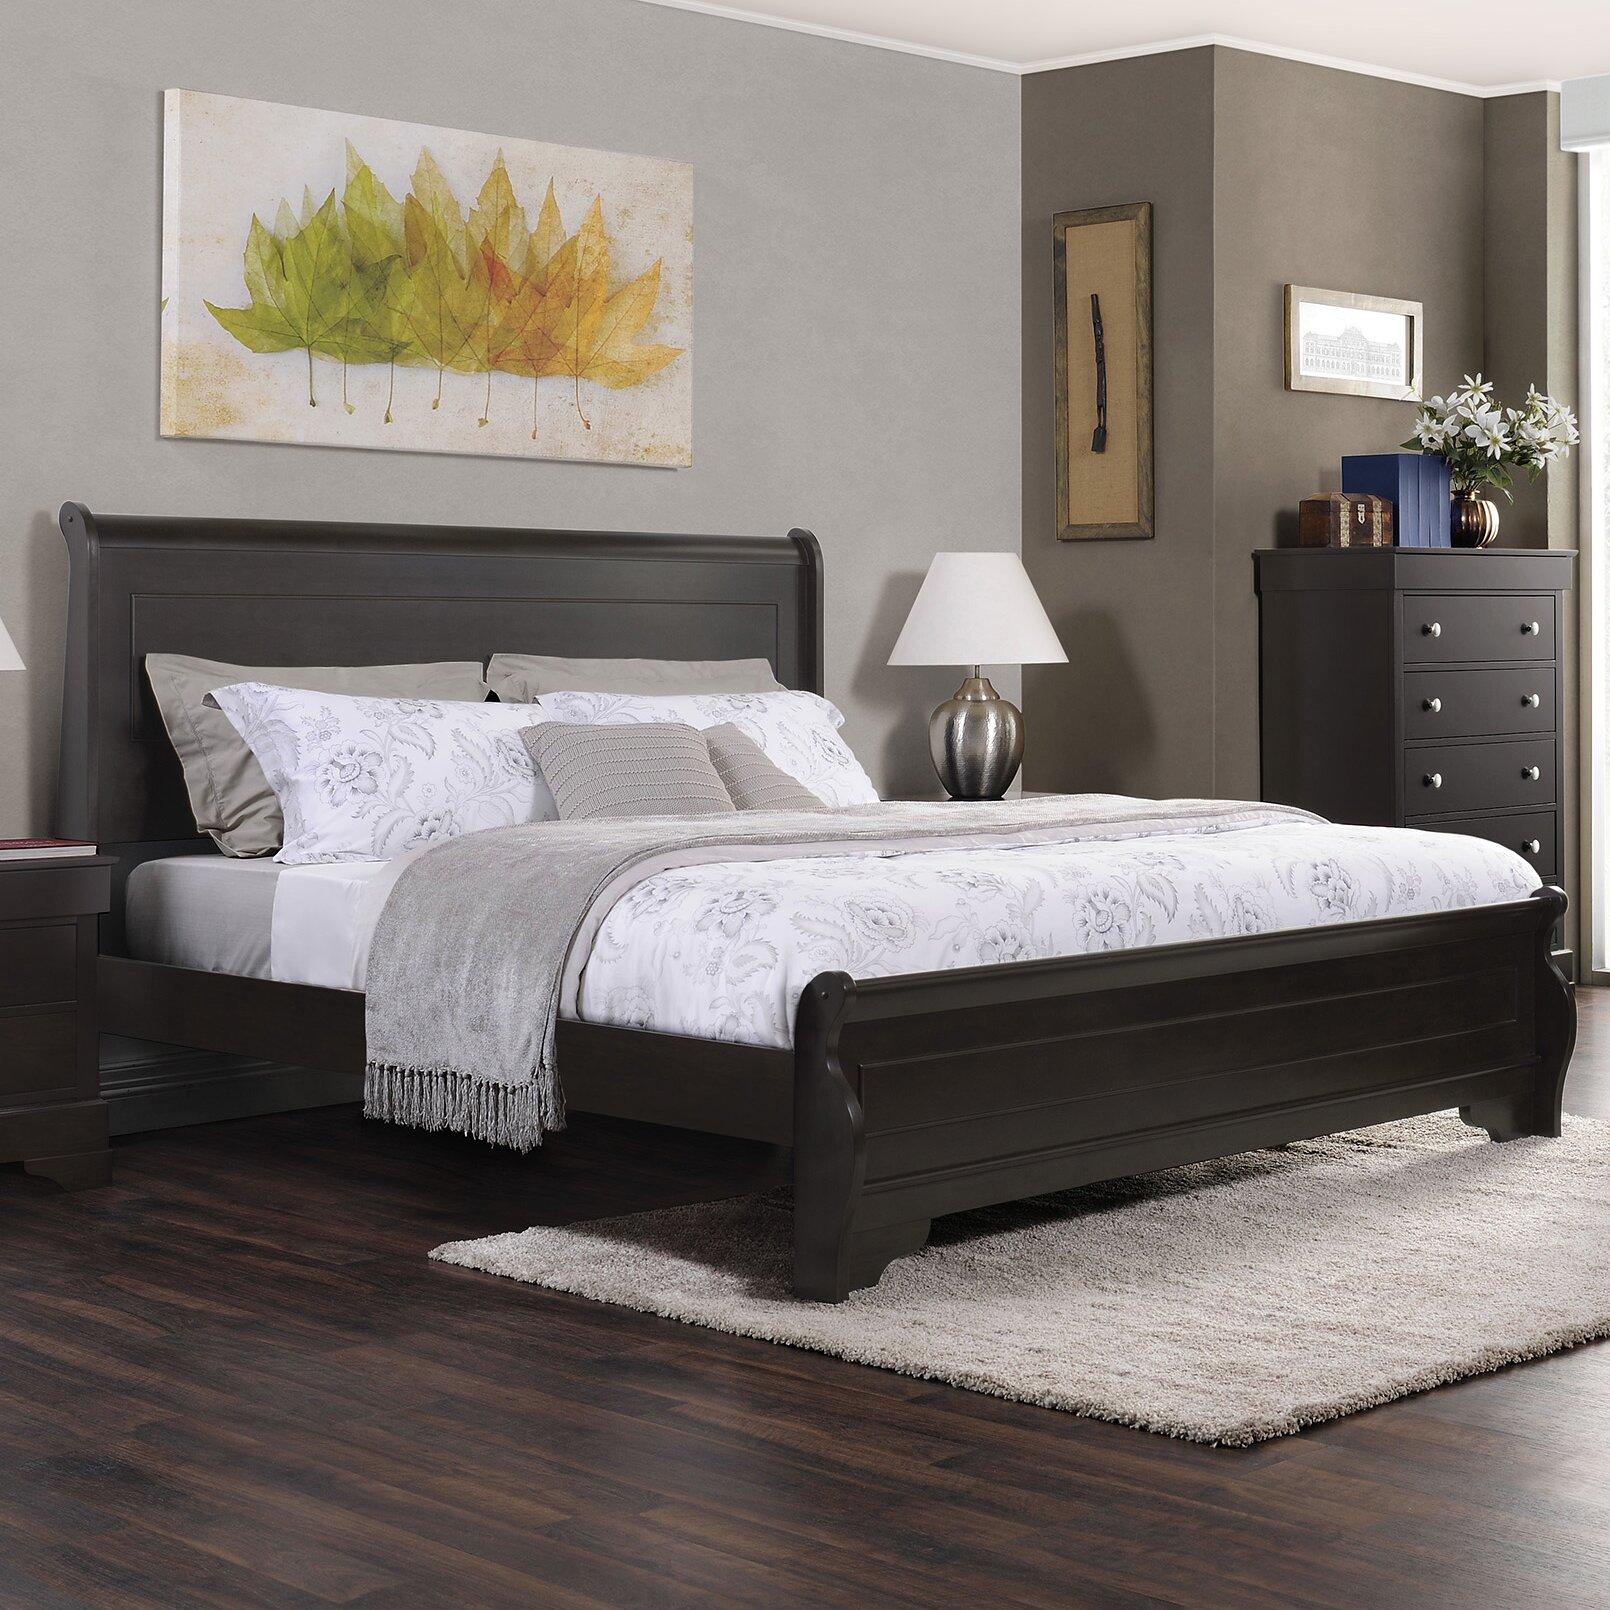 Manhattan Bedroom Furniture Domus Vita Design Manhattan Panel Bed Reviews Wayfair